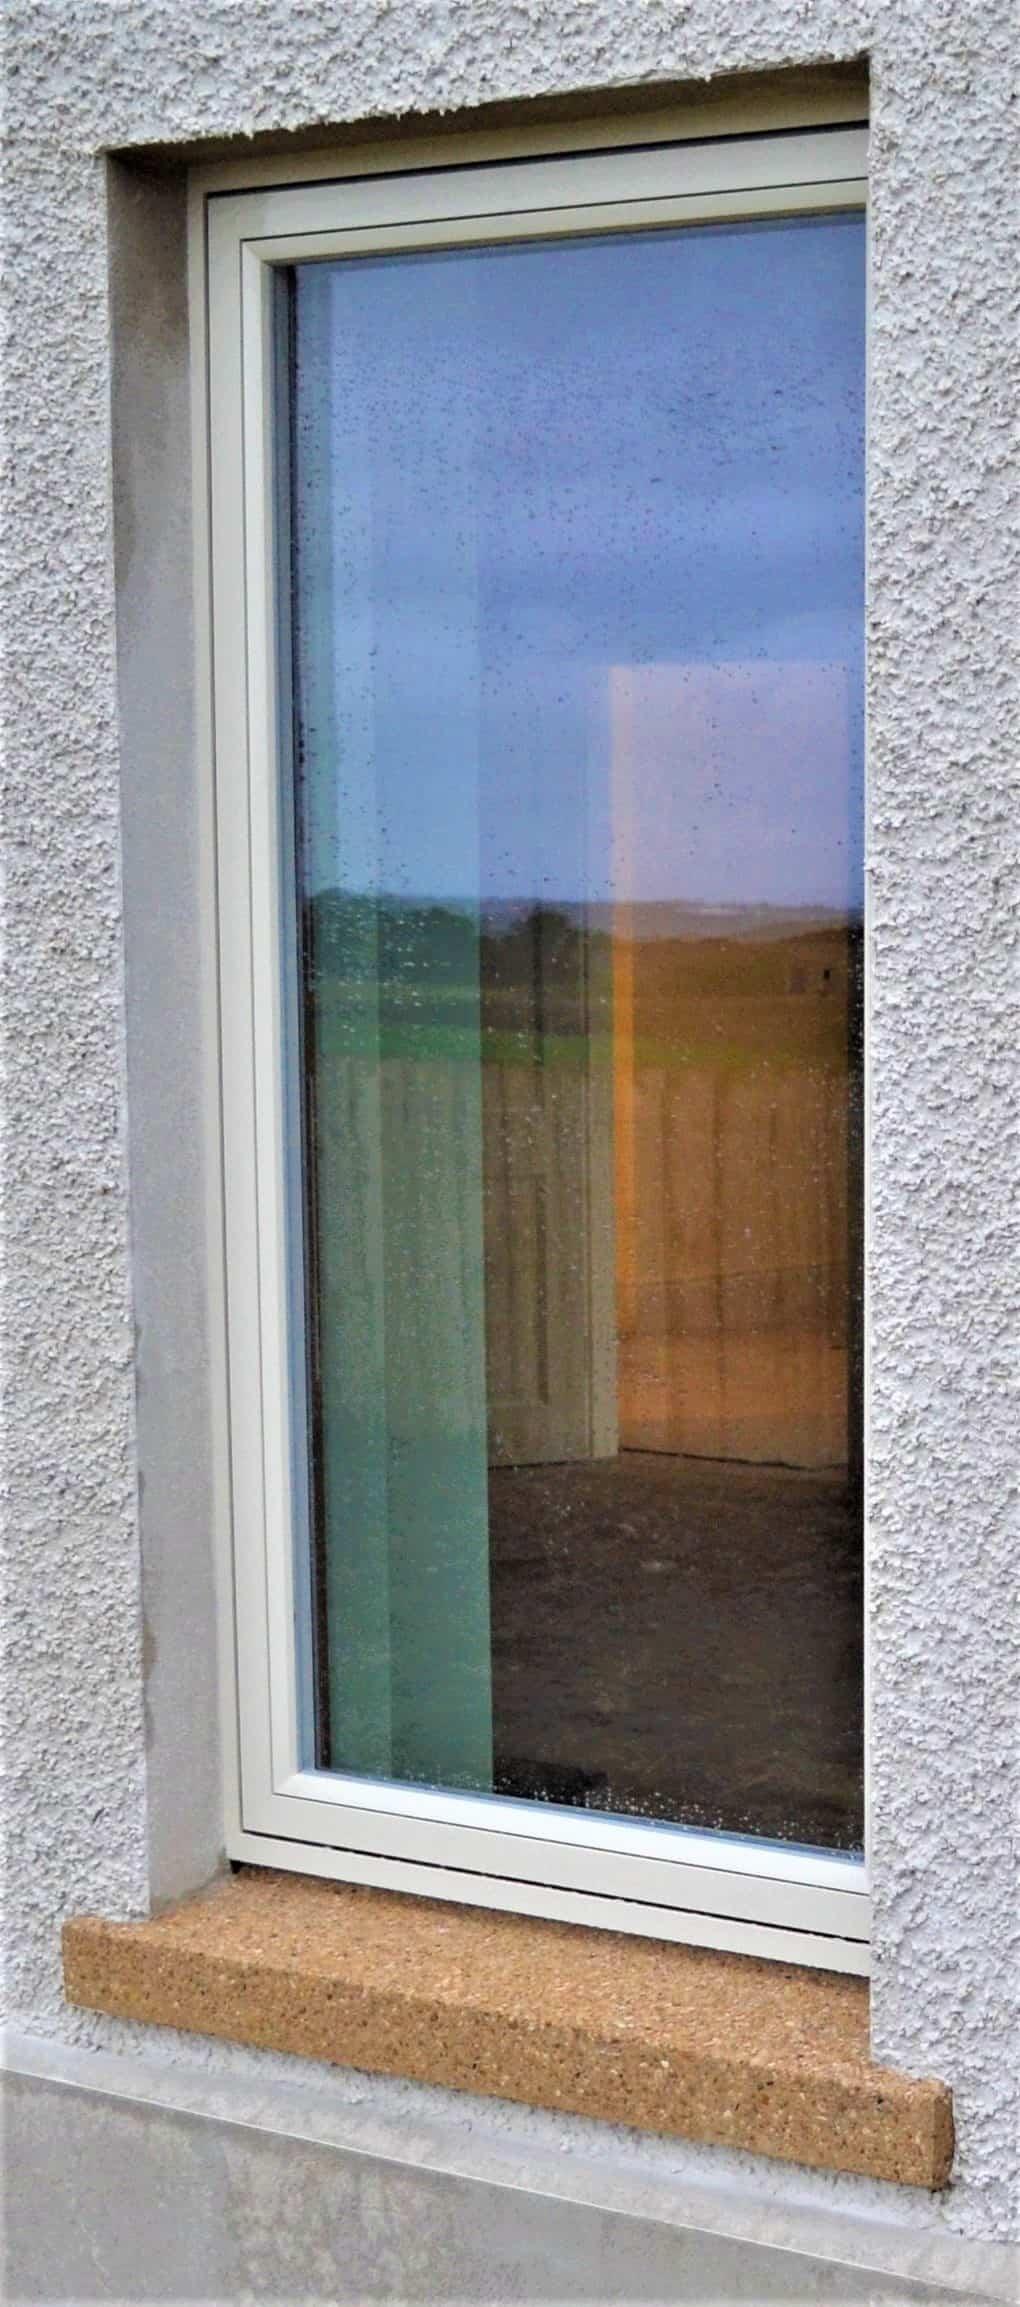 Quigg Dwelling - Timber Window